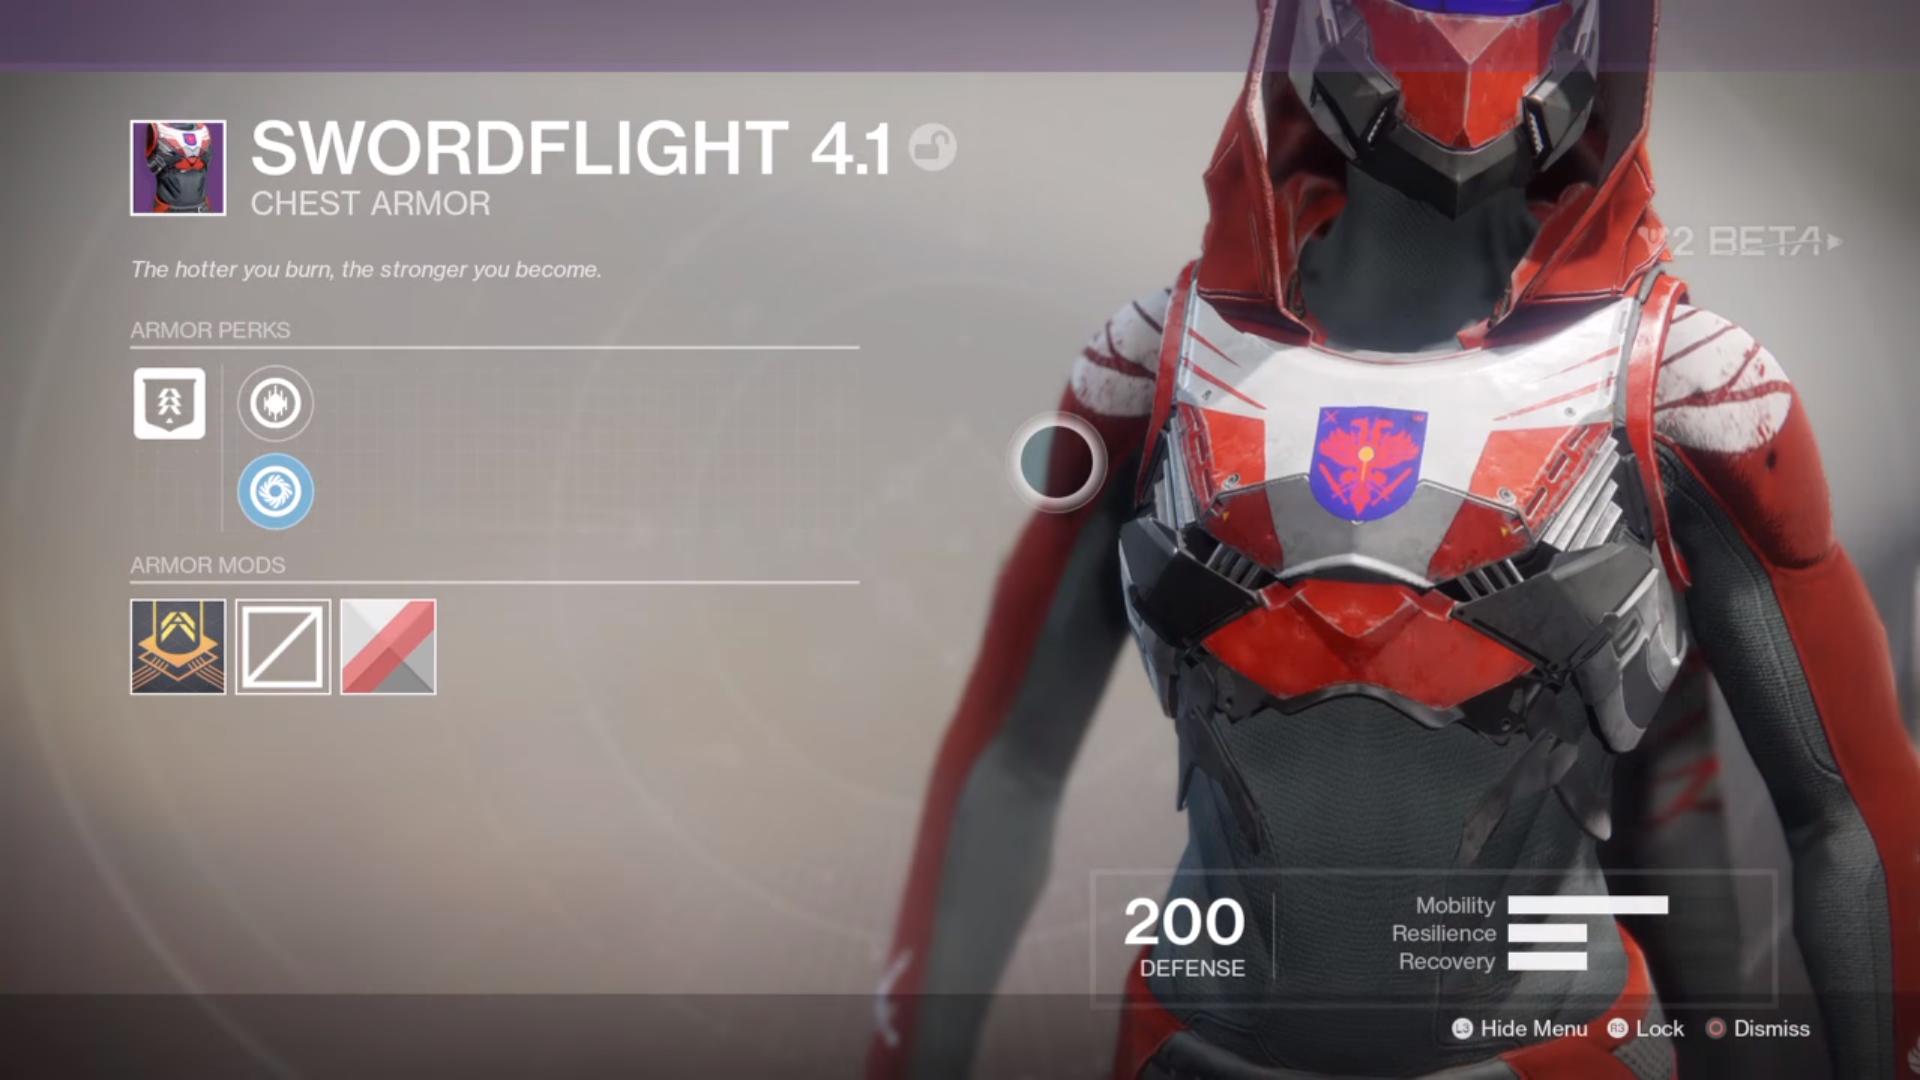 destiny 2 beta swordflight 4.1 chest